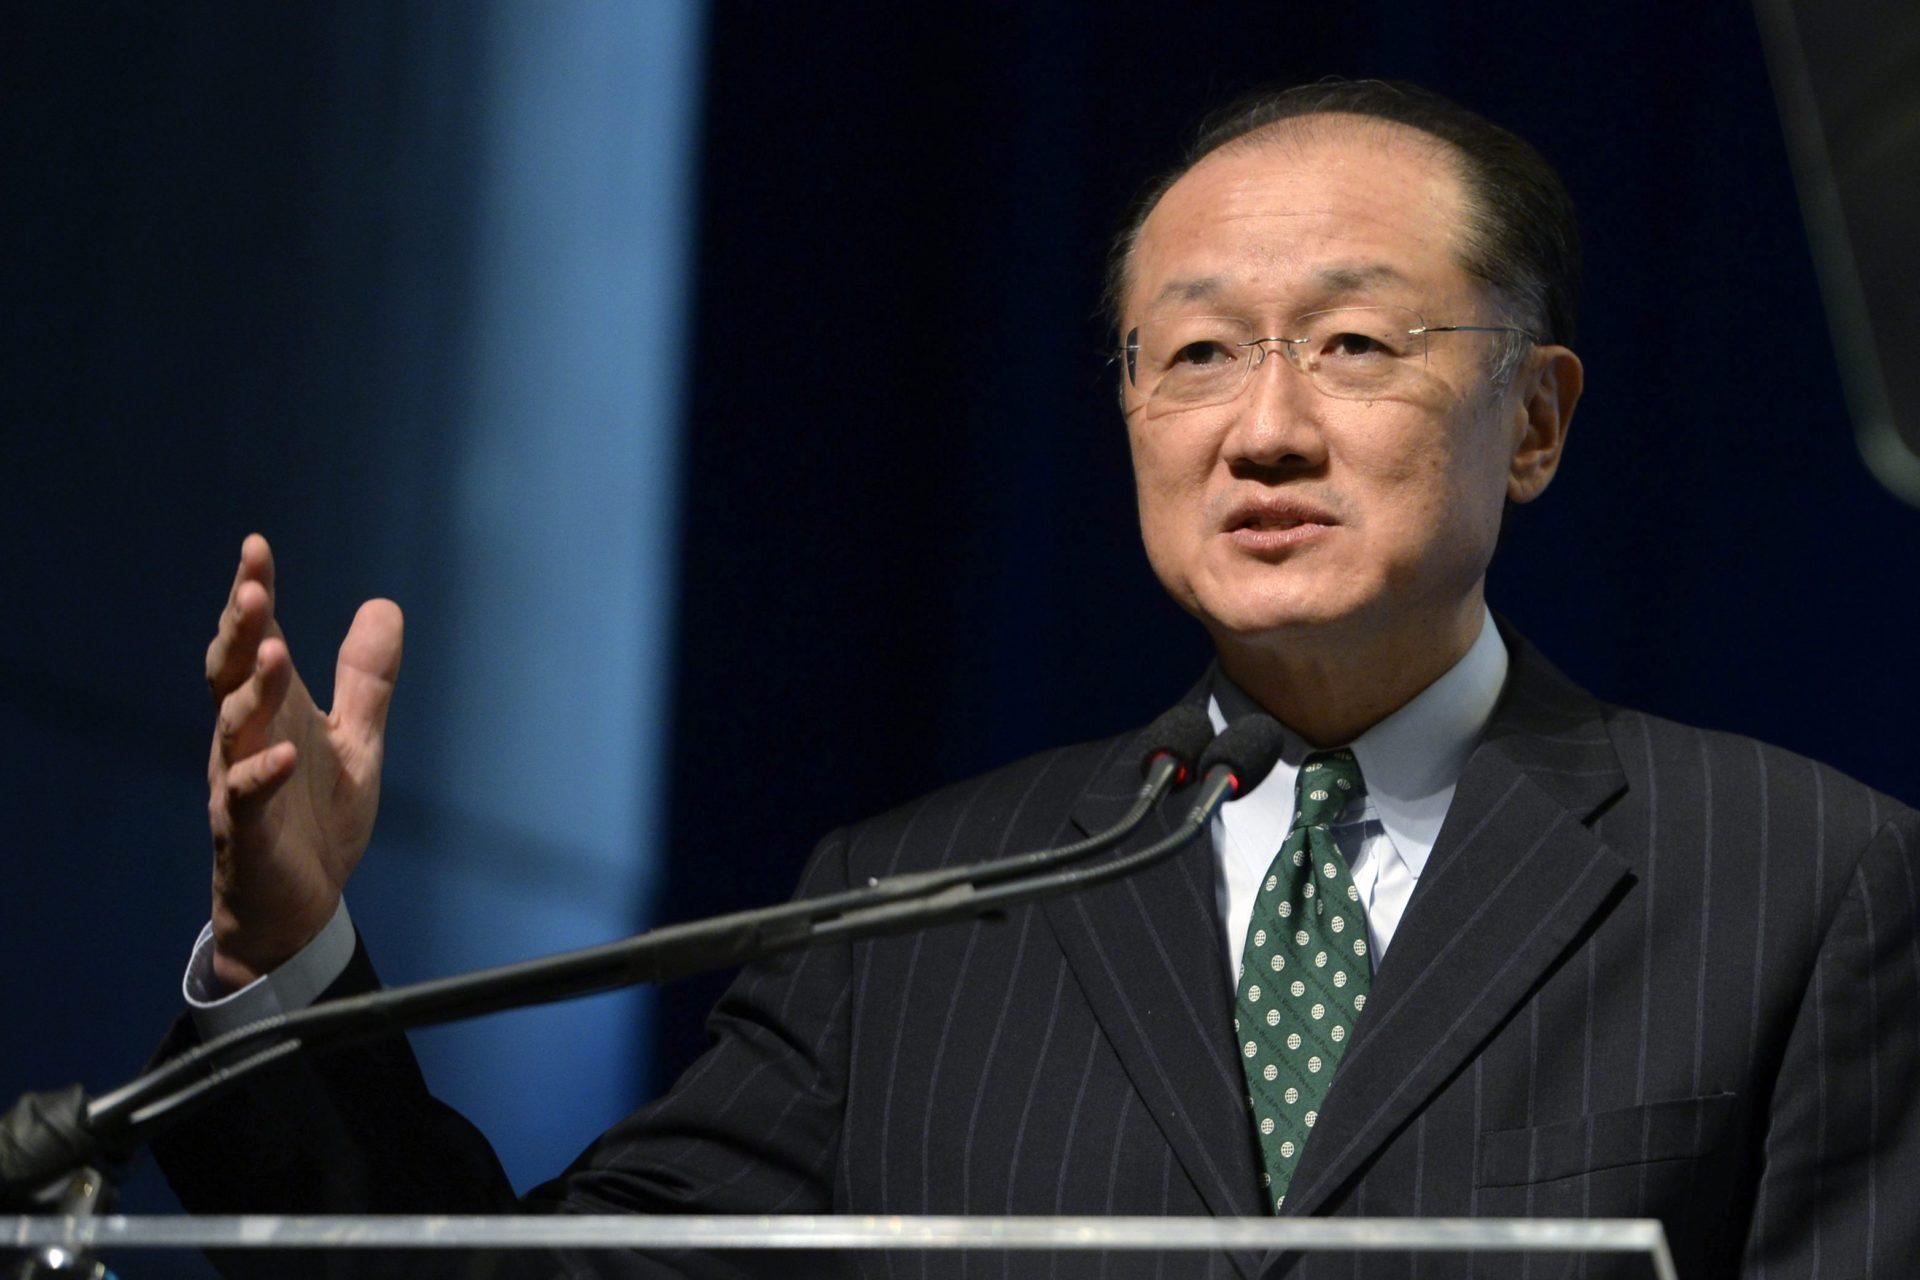 El presidente del Banco Mundial, Jim Yong Kim